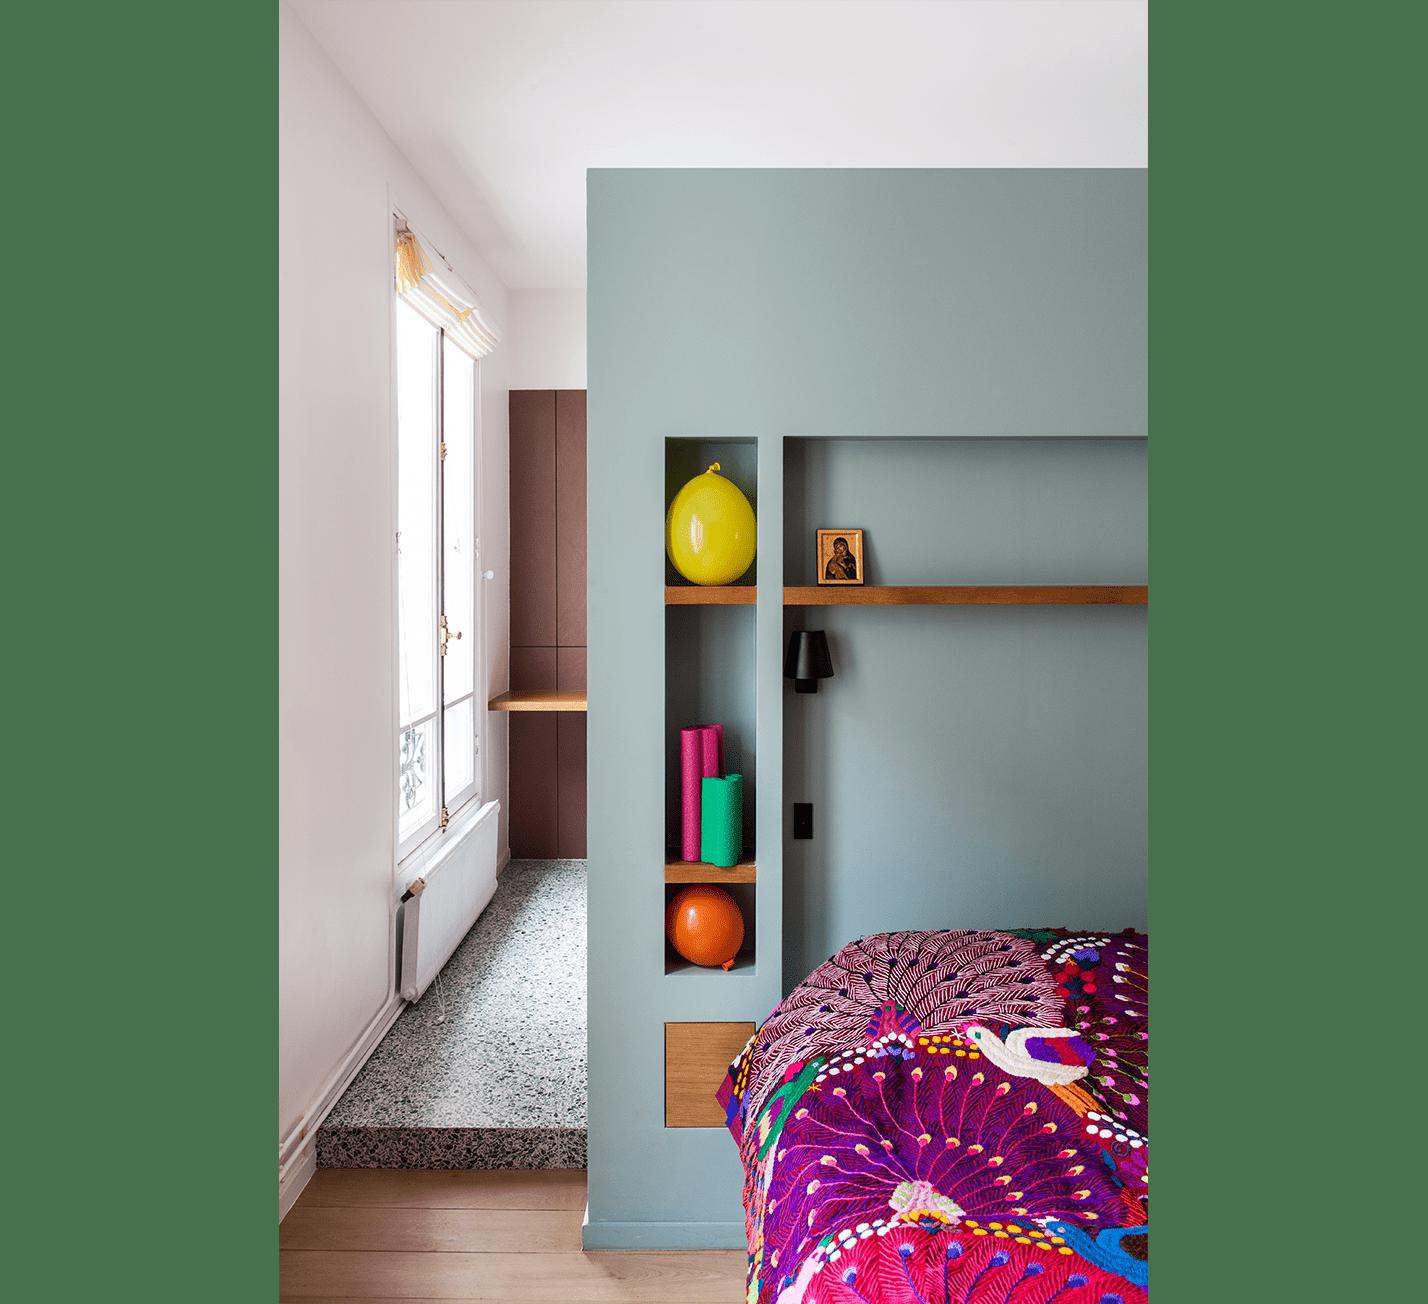 Projet-Arlequin-Atelier-Steve-Pauline-Borgia-Architecture-interieur-15-min